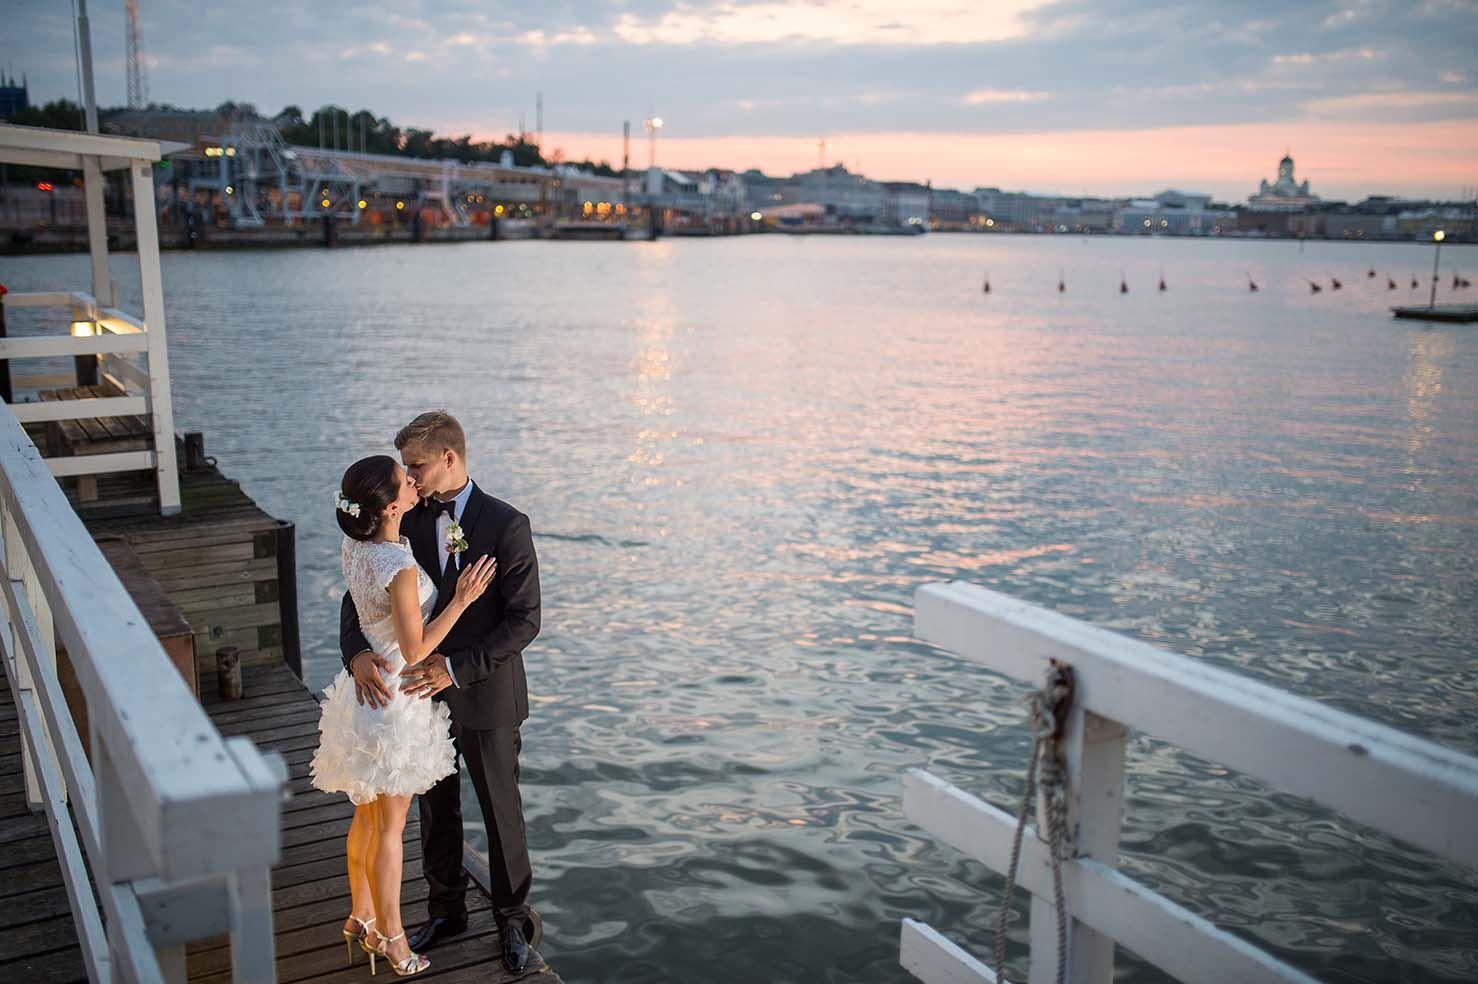 naimisiinmeno ulkomailla